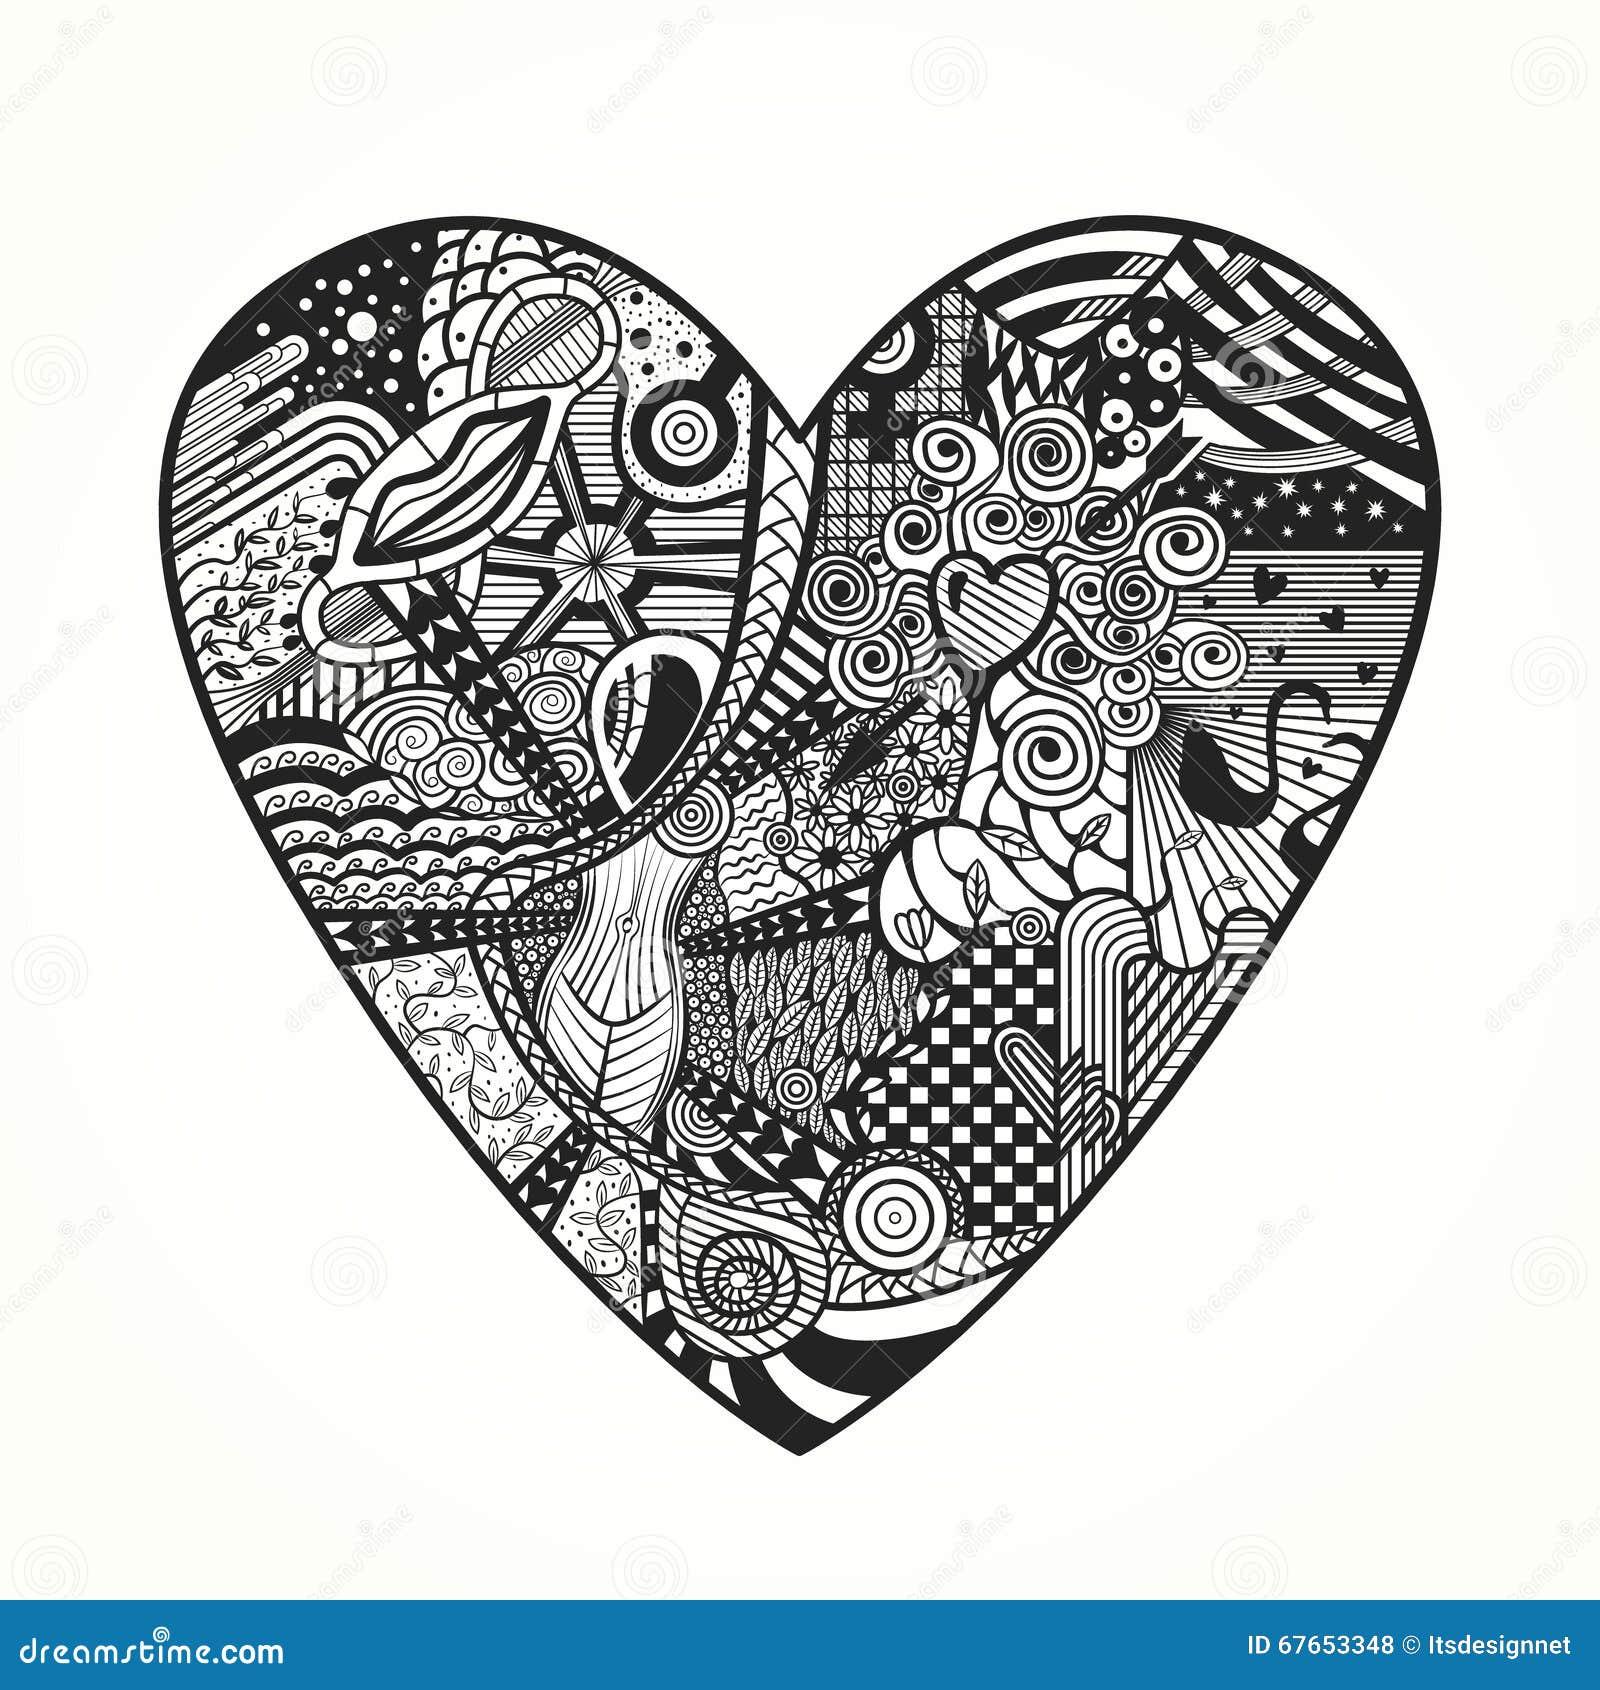 195 best images about Zenspirational Hearts on Pinterest ... |Zentangle Heart Graphics